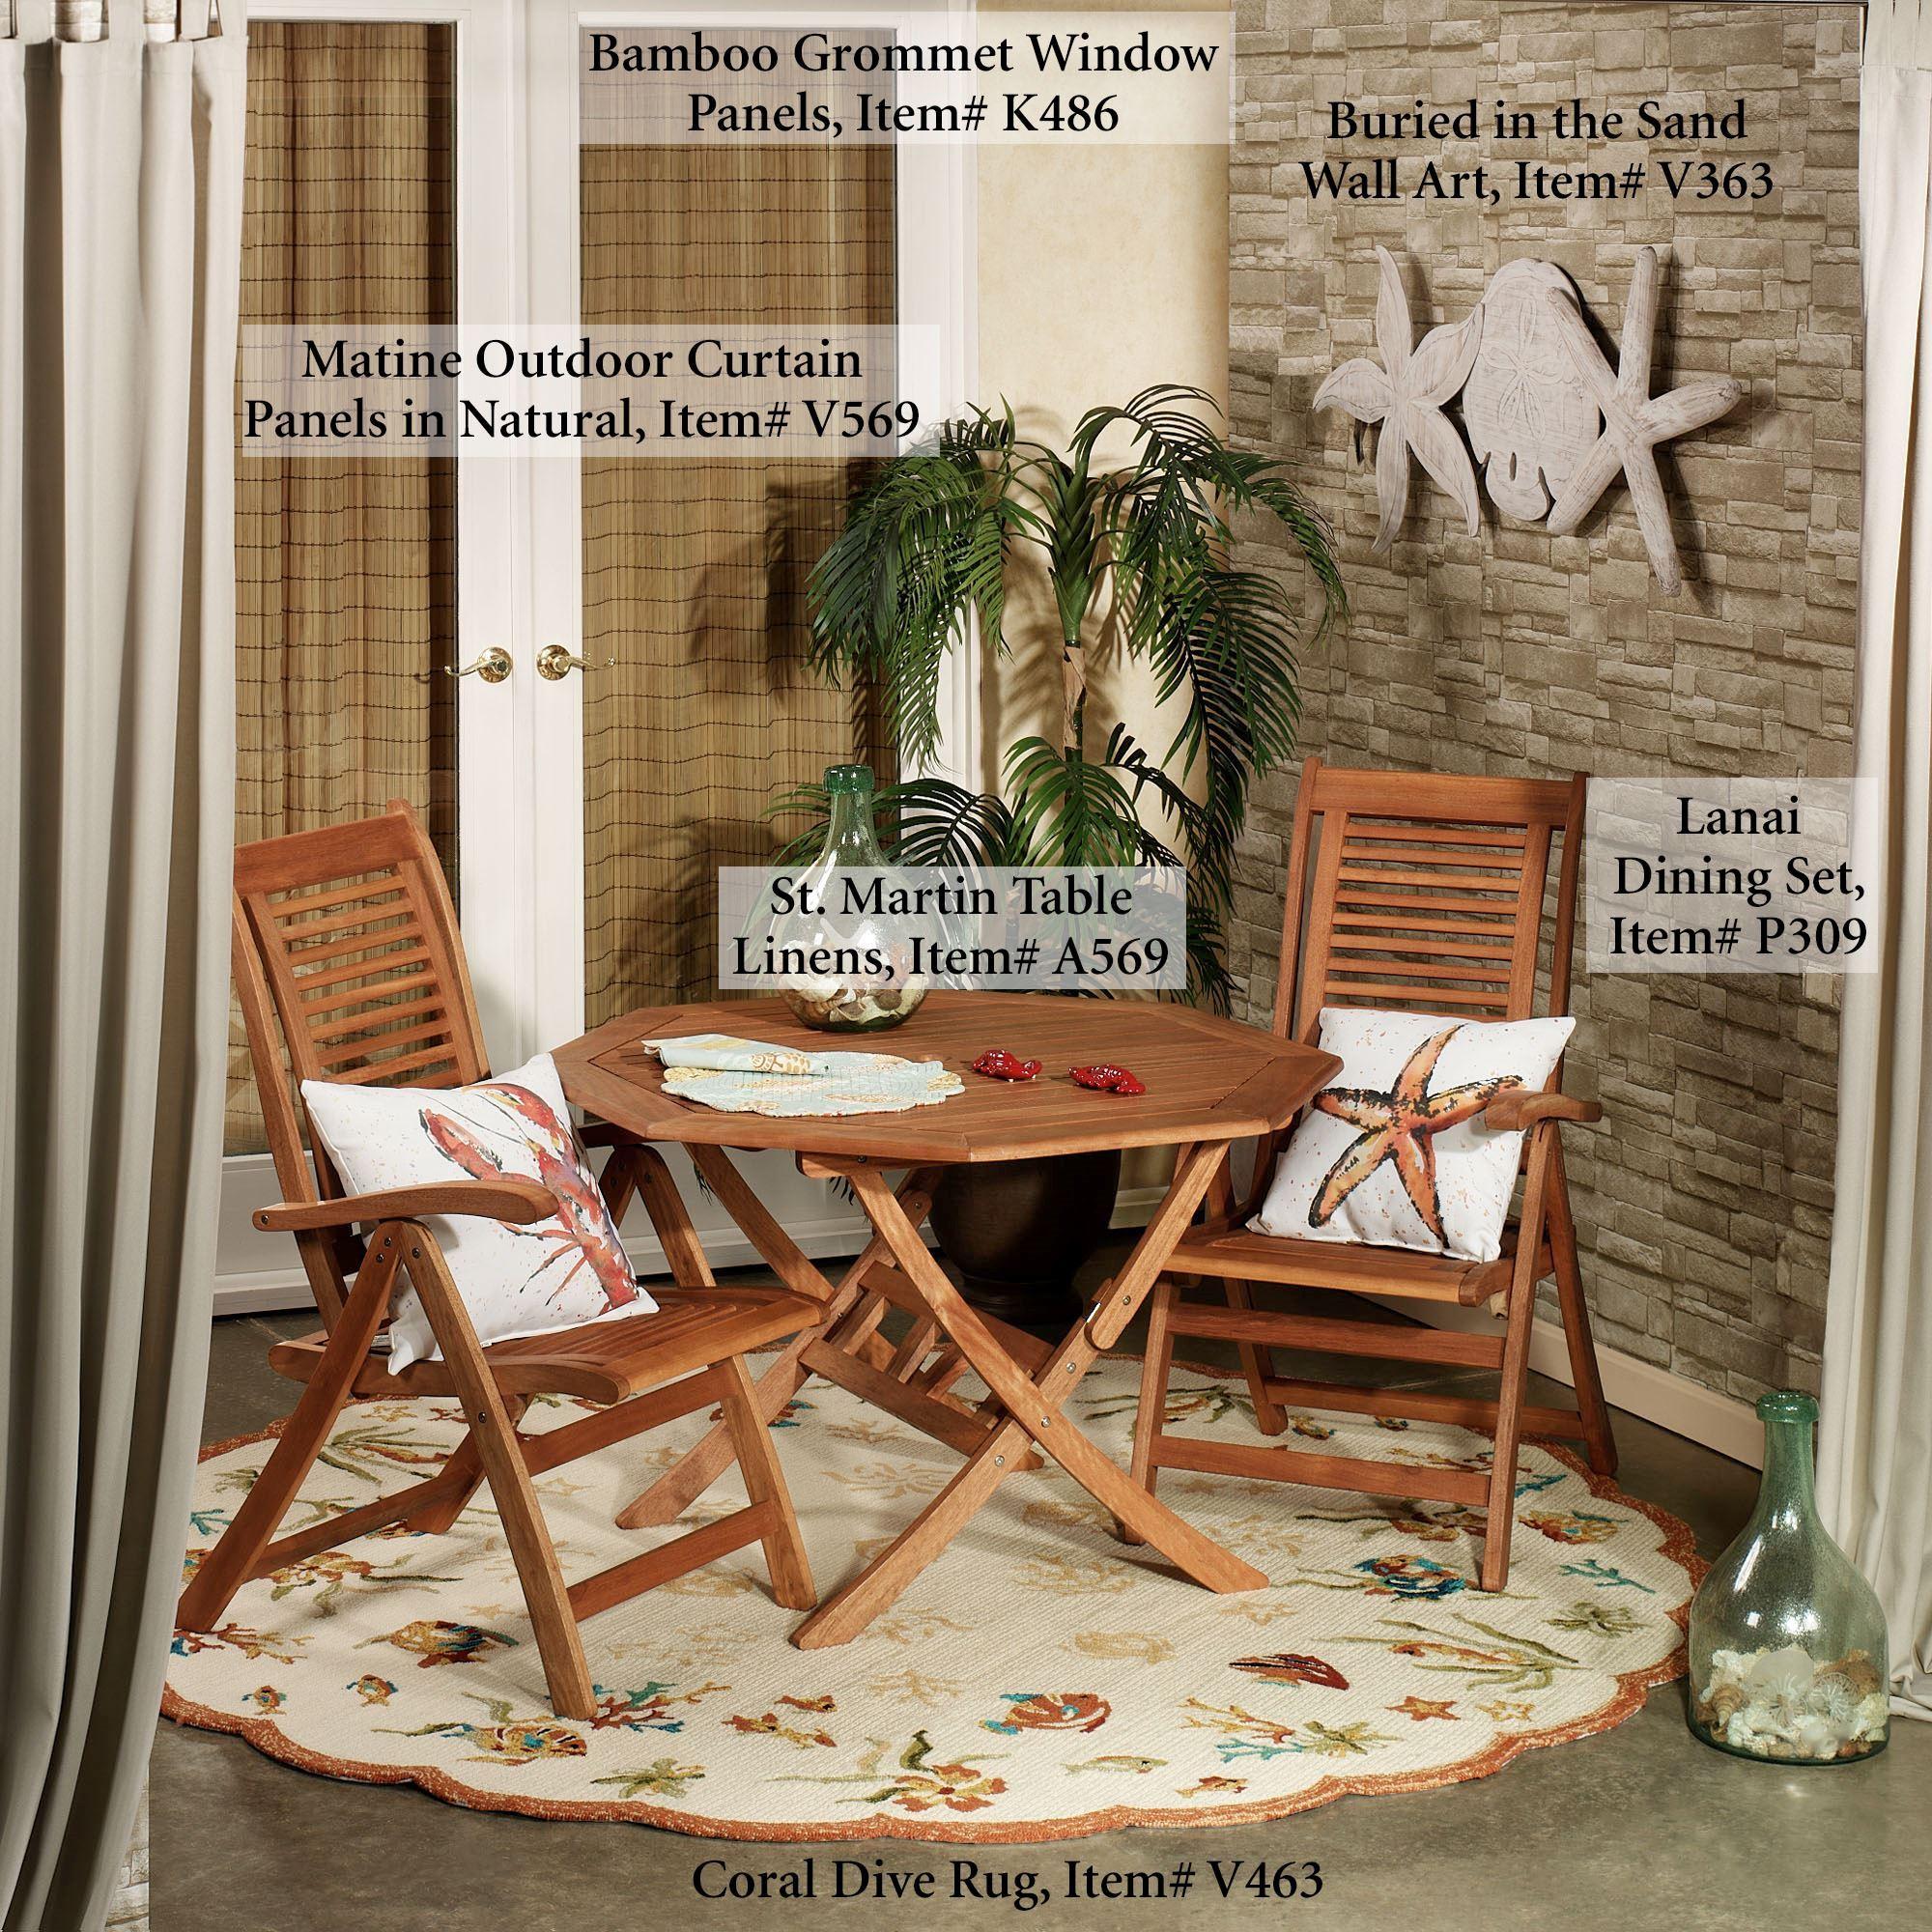 Matine Indoor Outdoor Tab Top Curtain Panels For Matine Indoor/outdoor Curtain Panels (View 13 of 20)